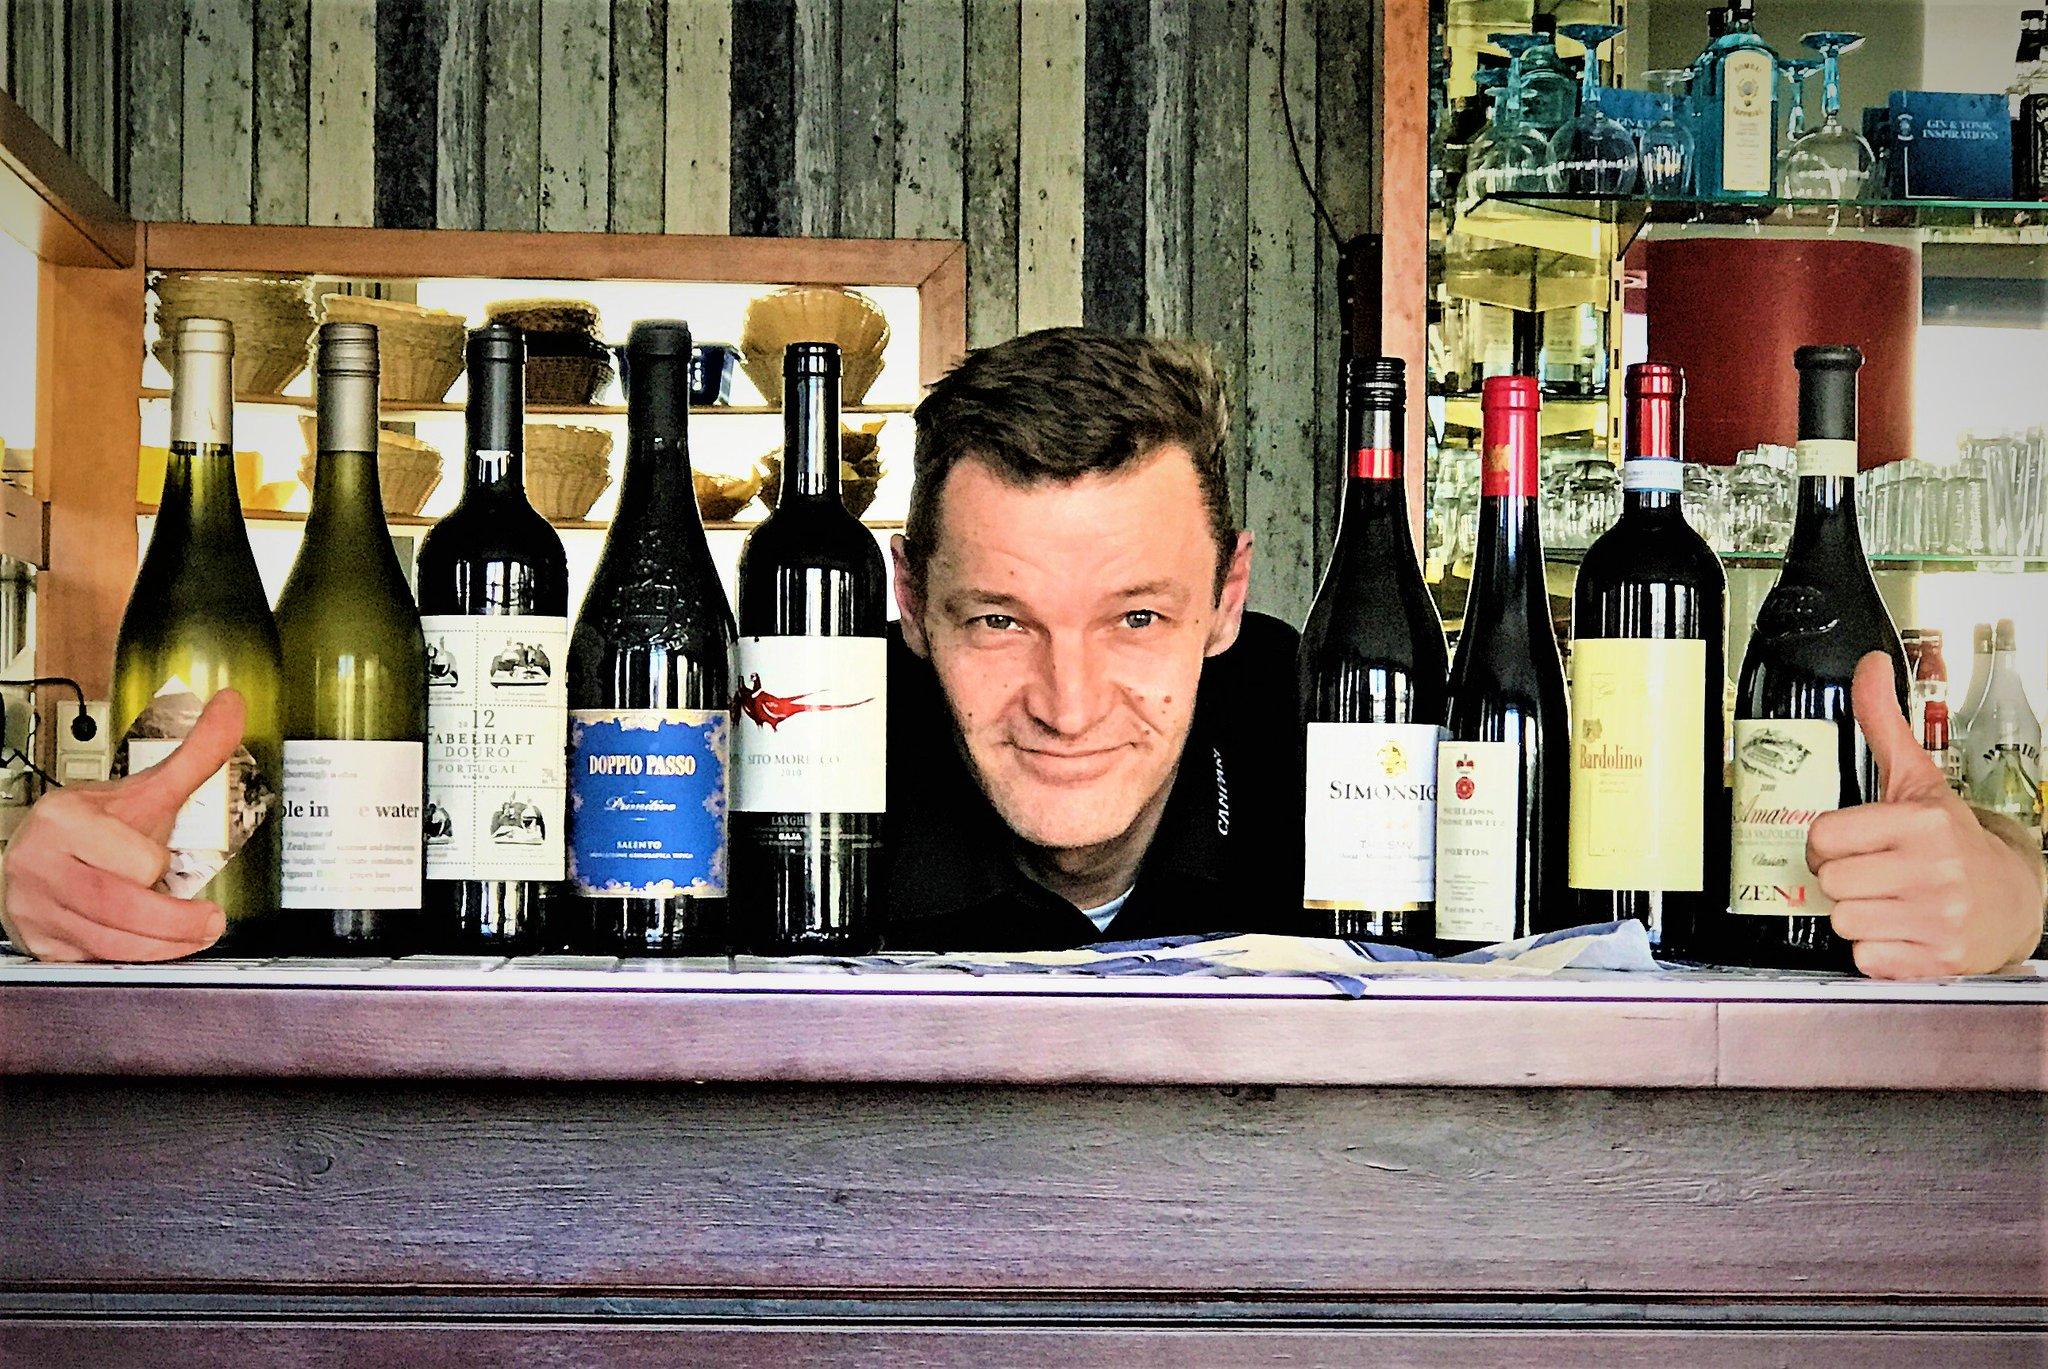 Wine Wein Vino Vinos cover image